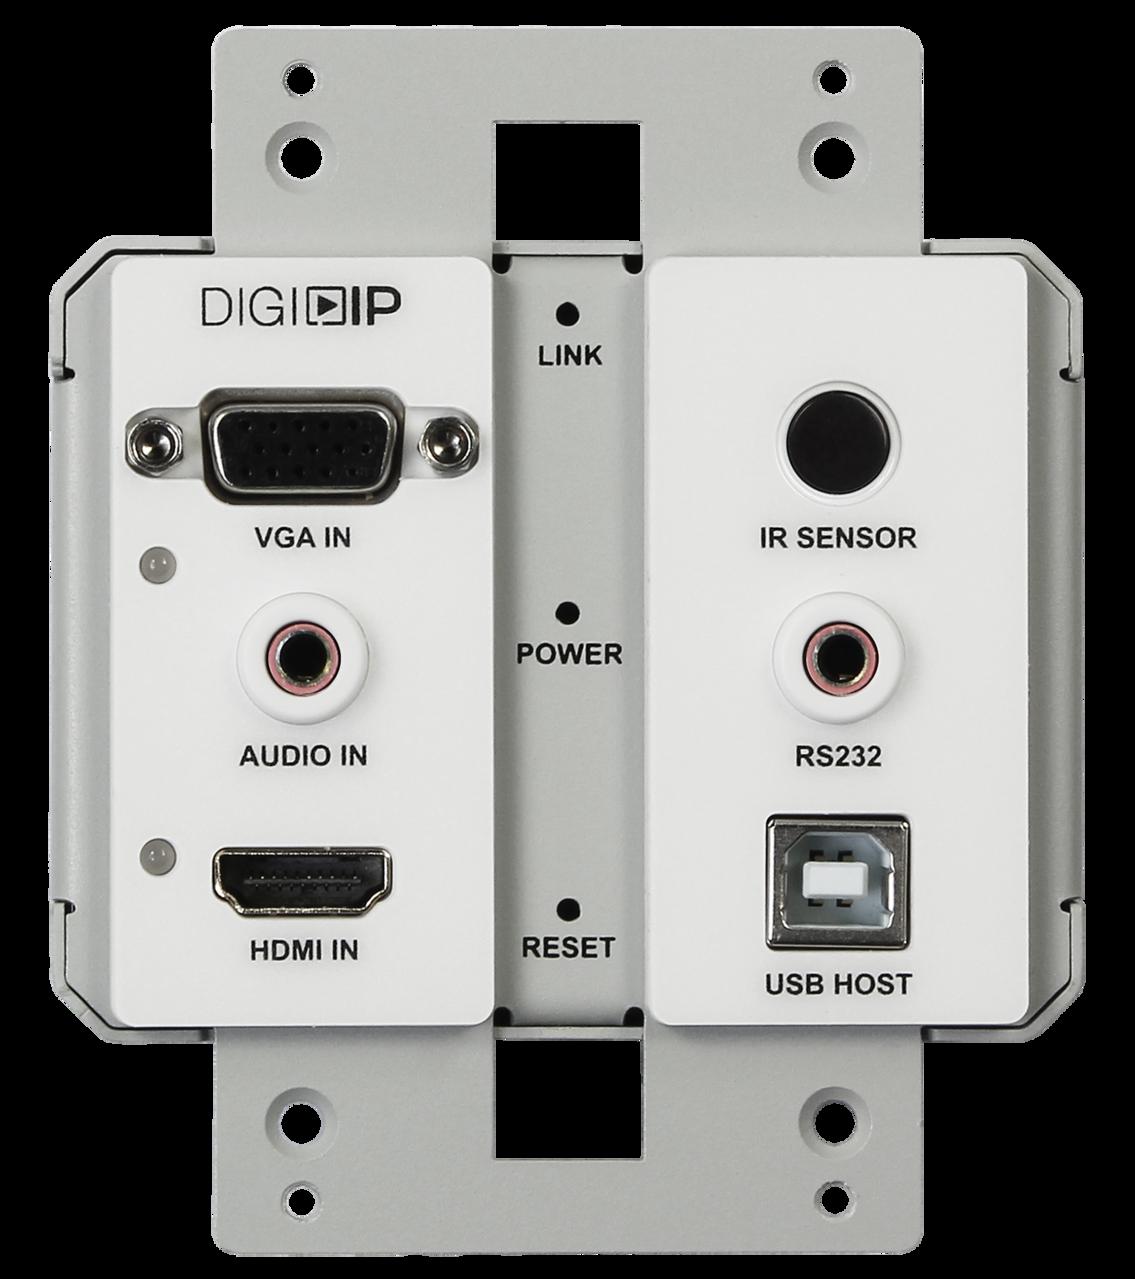 IPEX5001-WP-W - DigitalinxIP 5000 Series AV Over IP HDMI / VGA w/Audio auto Switching 4K Wall Plate Encoder